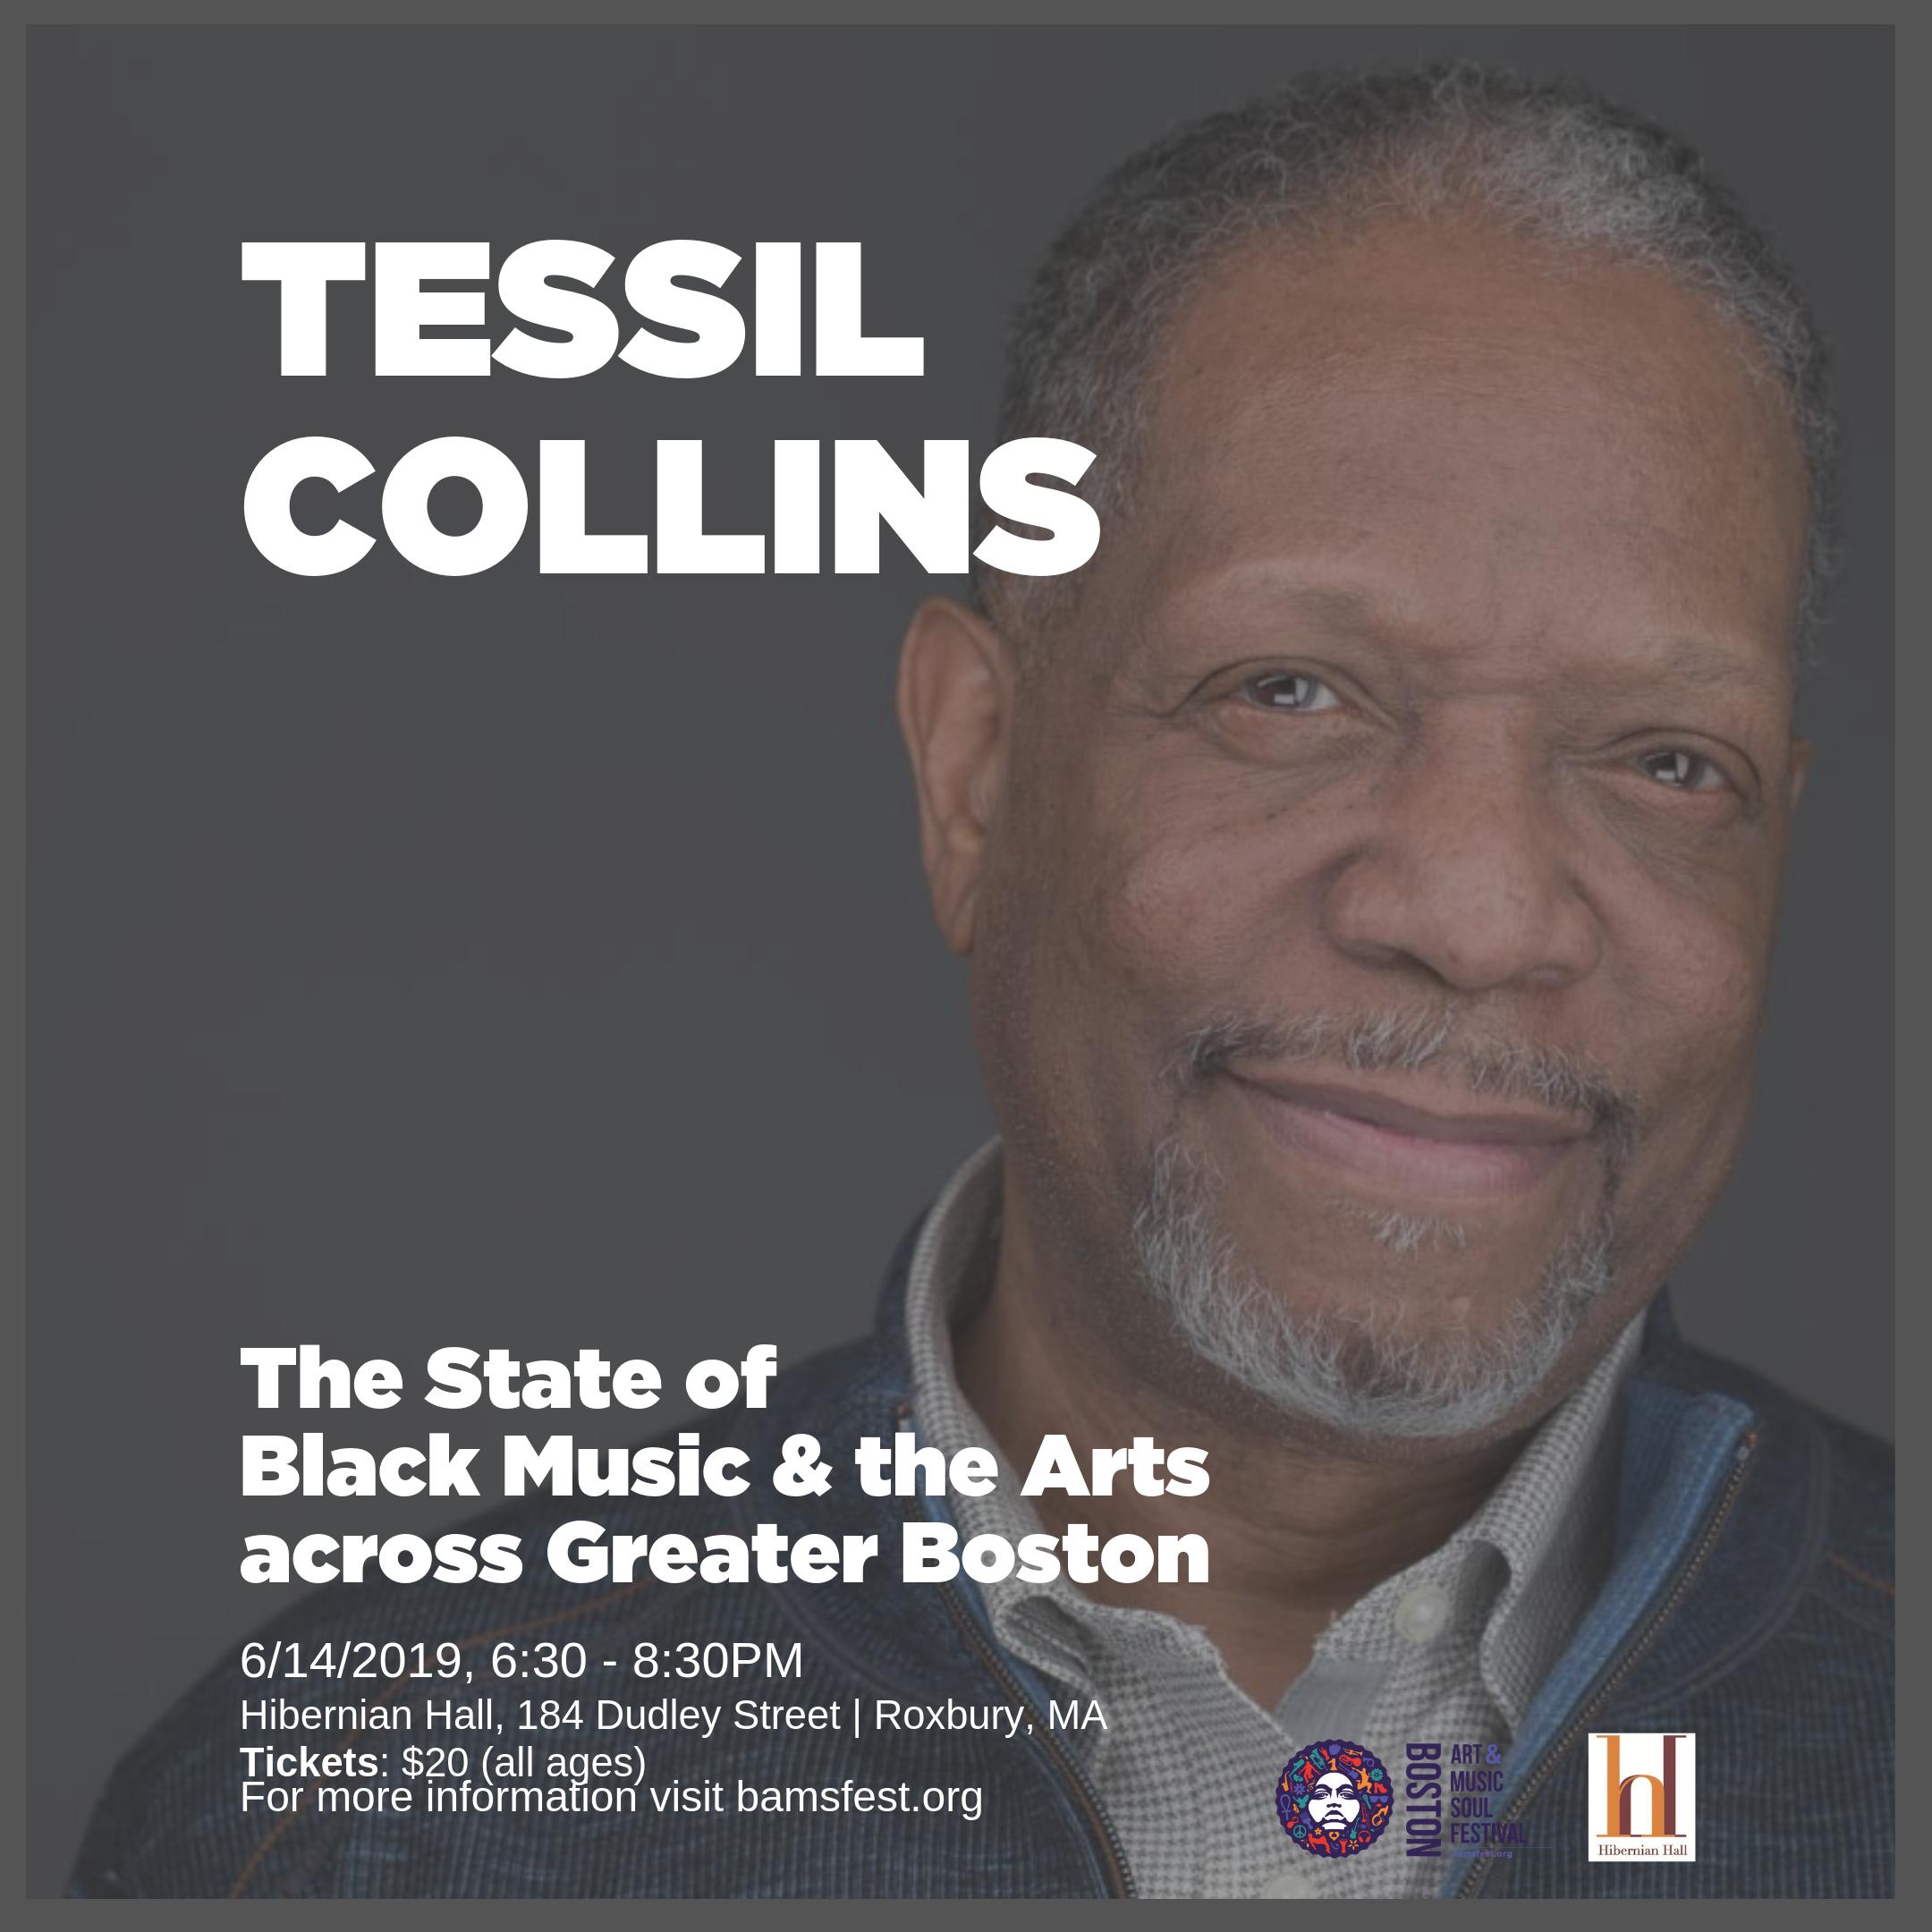 Instagram_6_14_2019 Tessil Collins - Cop